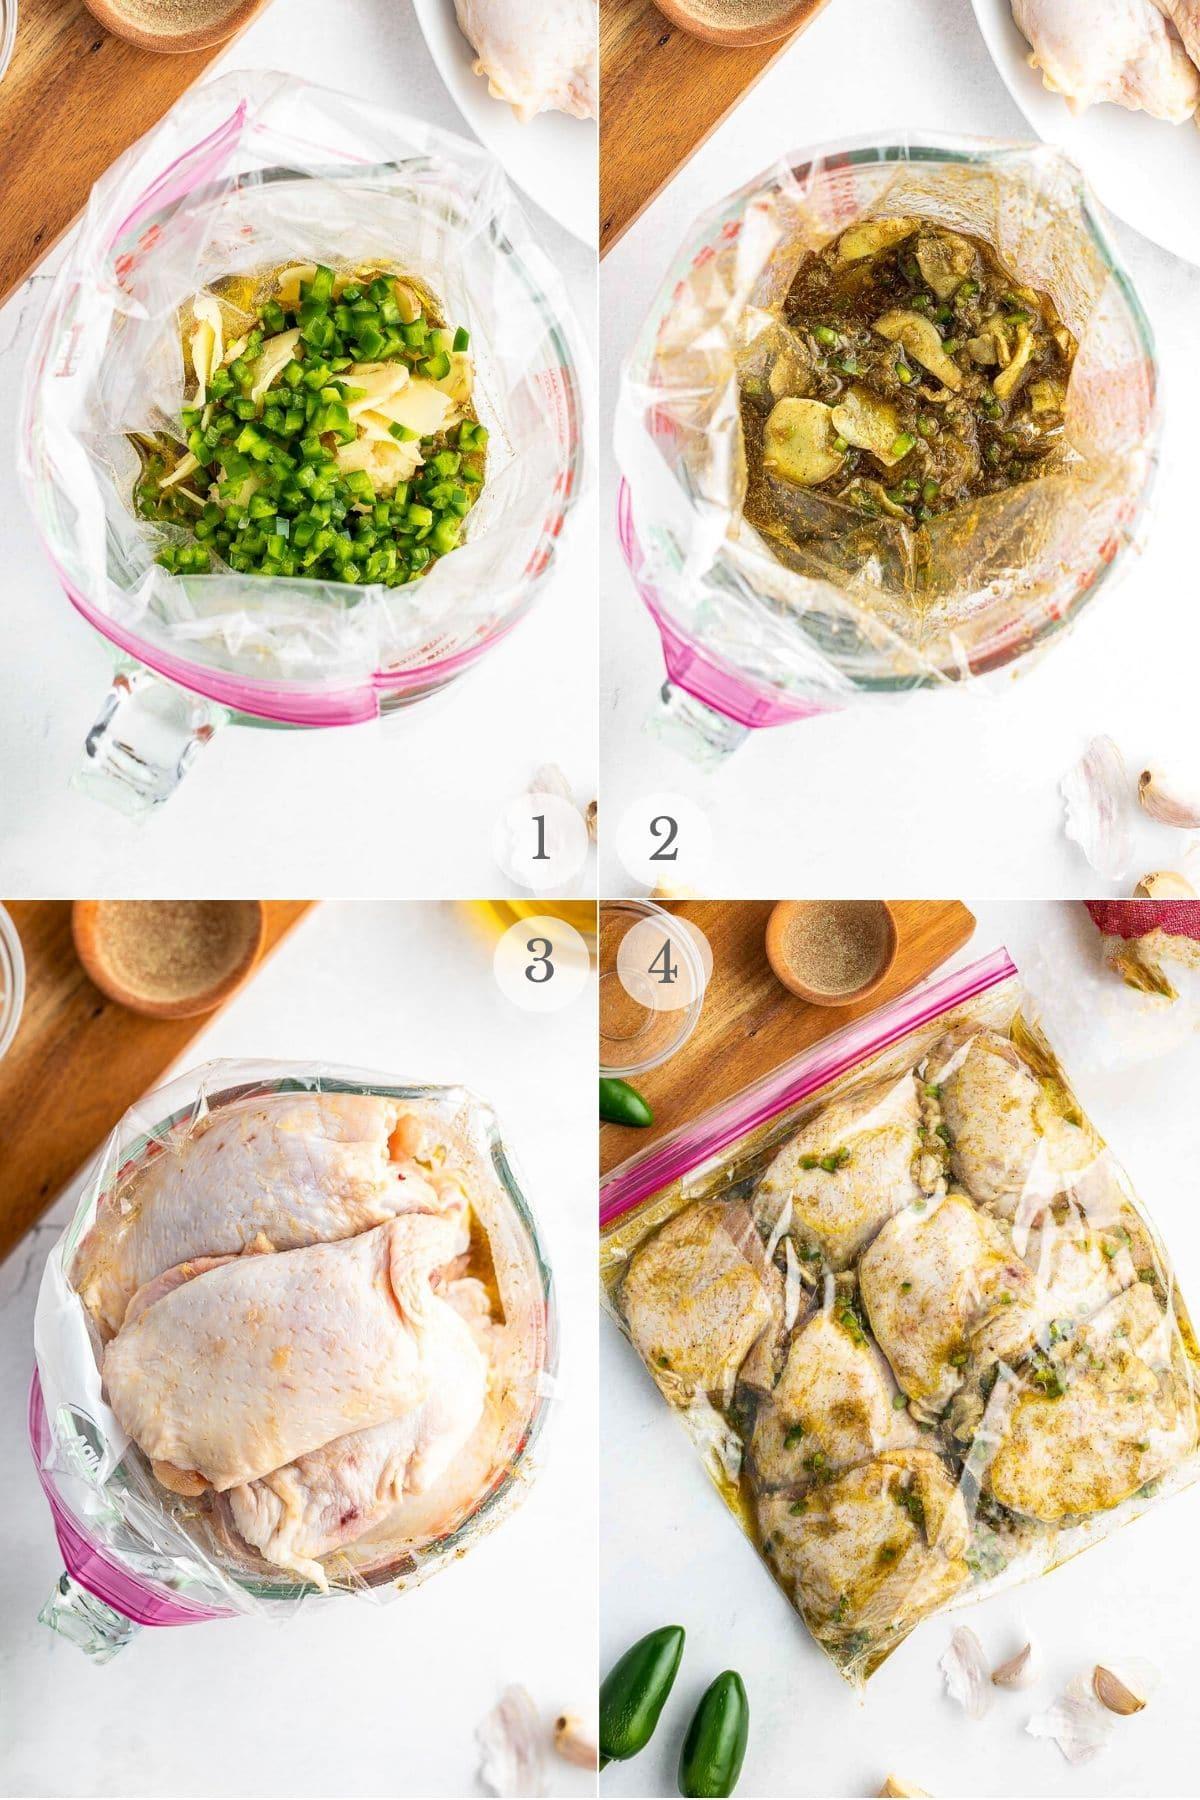 Marinade Marinade and Chicken Leg Recipe Steps Collage